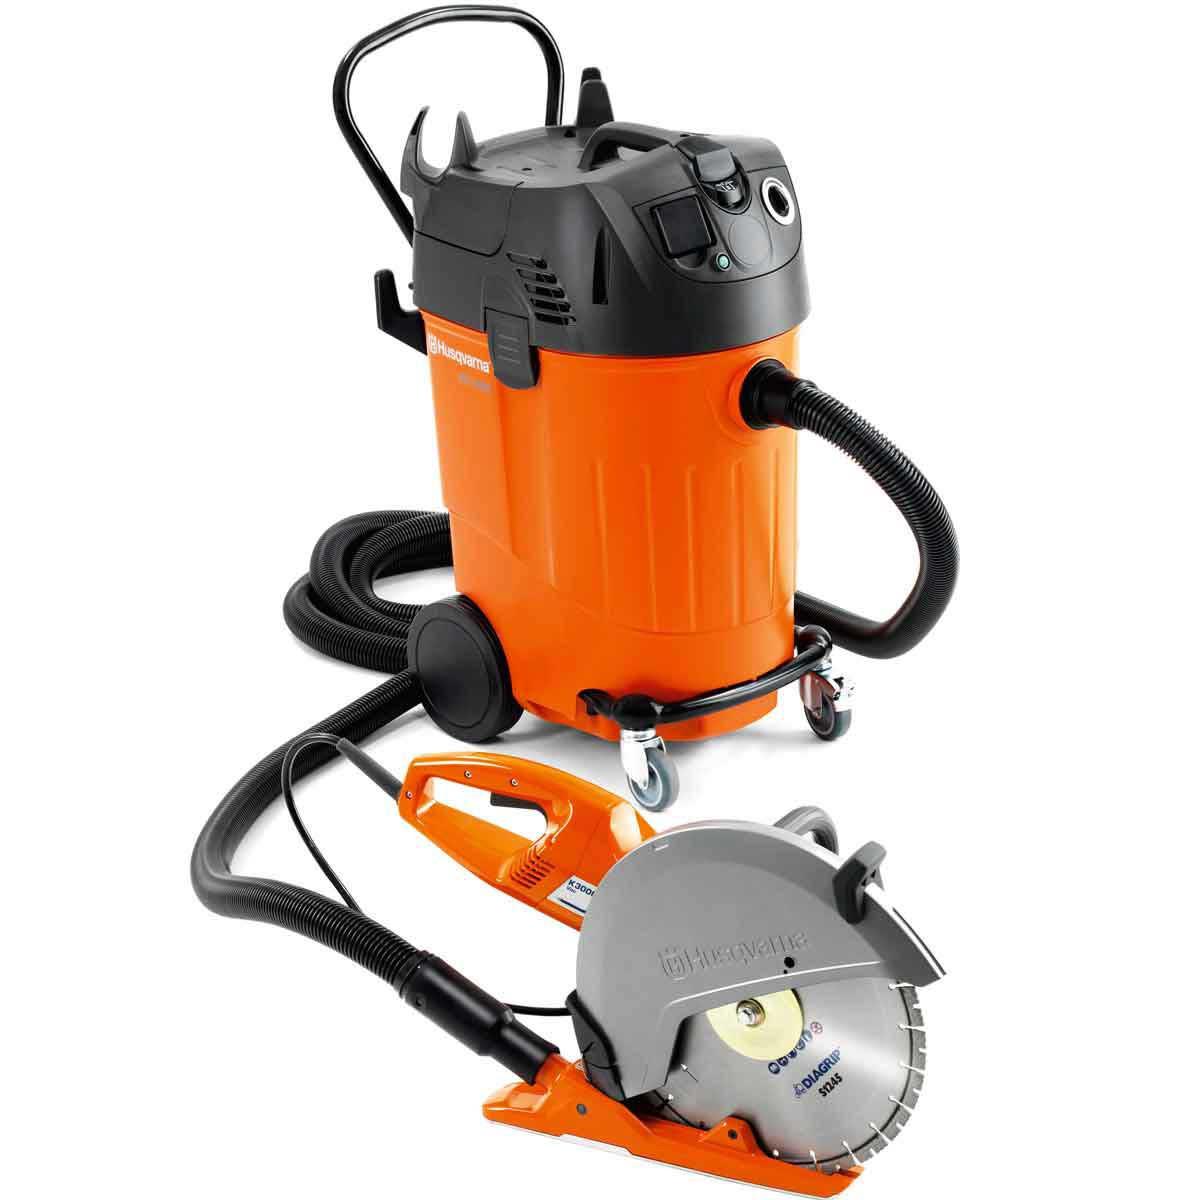 Husqvarna K3000 electric Vacuum